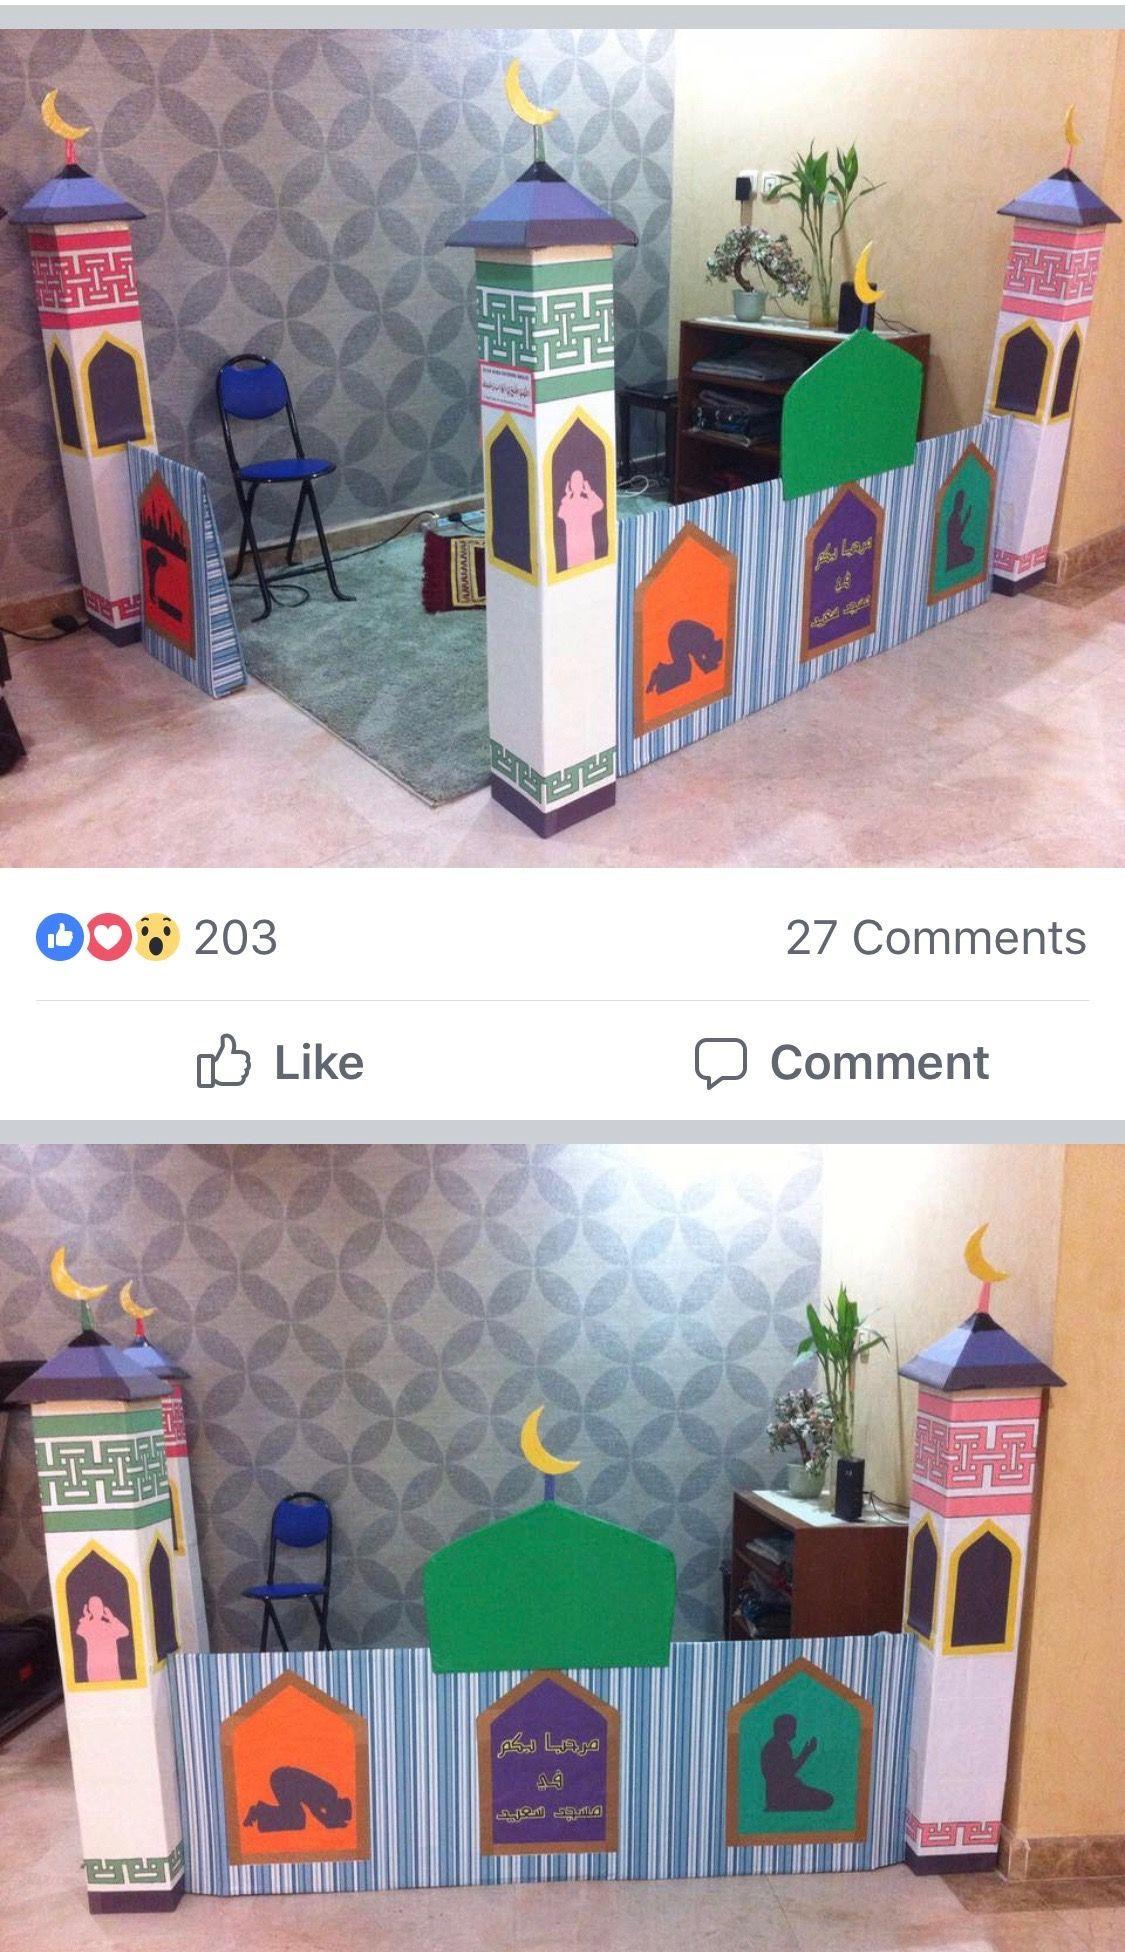 Diy Build Your Own Cardboard Play Masjid Mosque Ramadan Kids Ramadan Crafts Muslim Kids Crafts